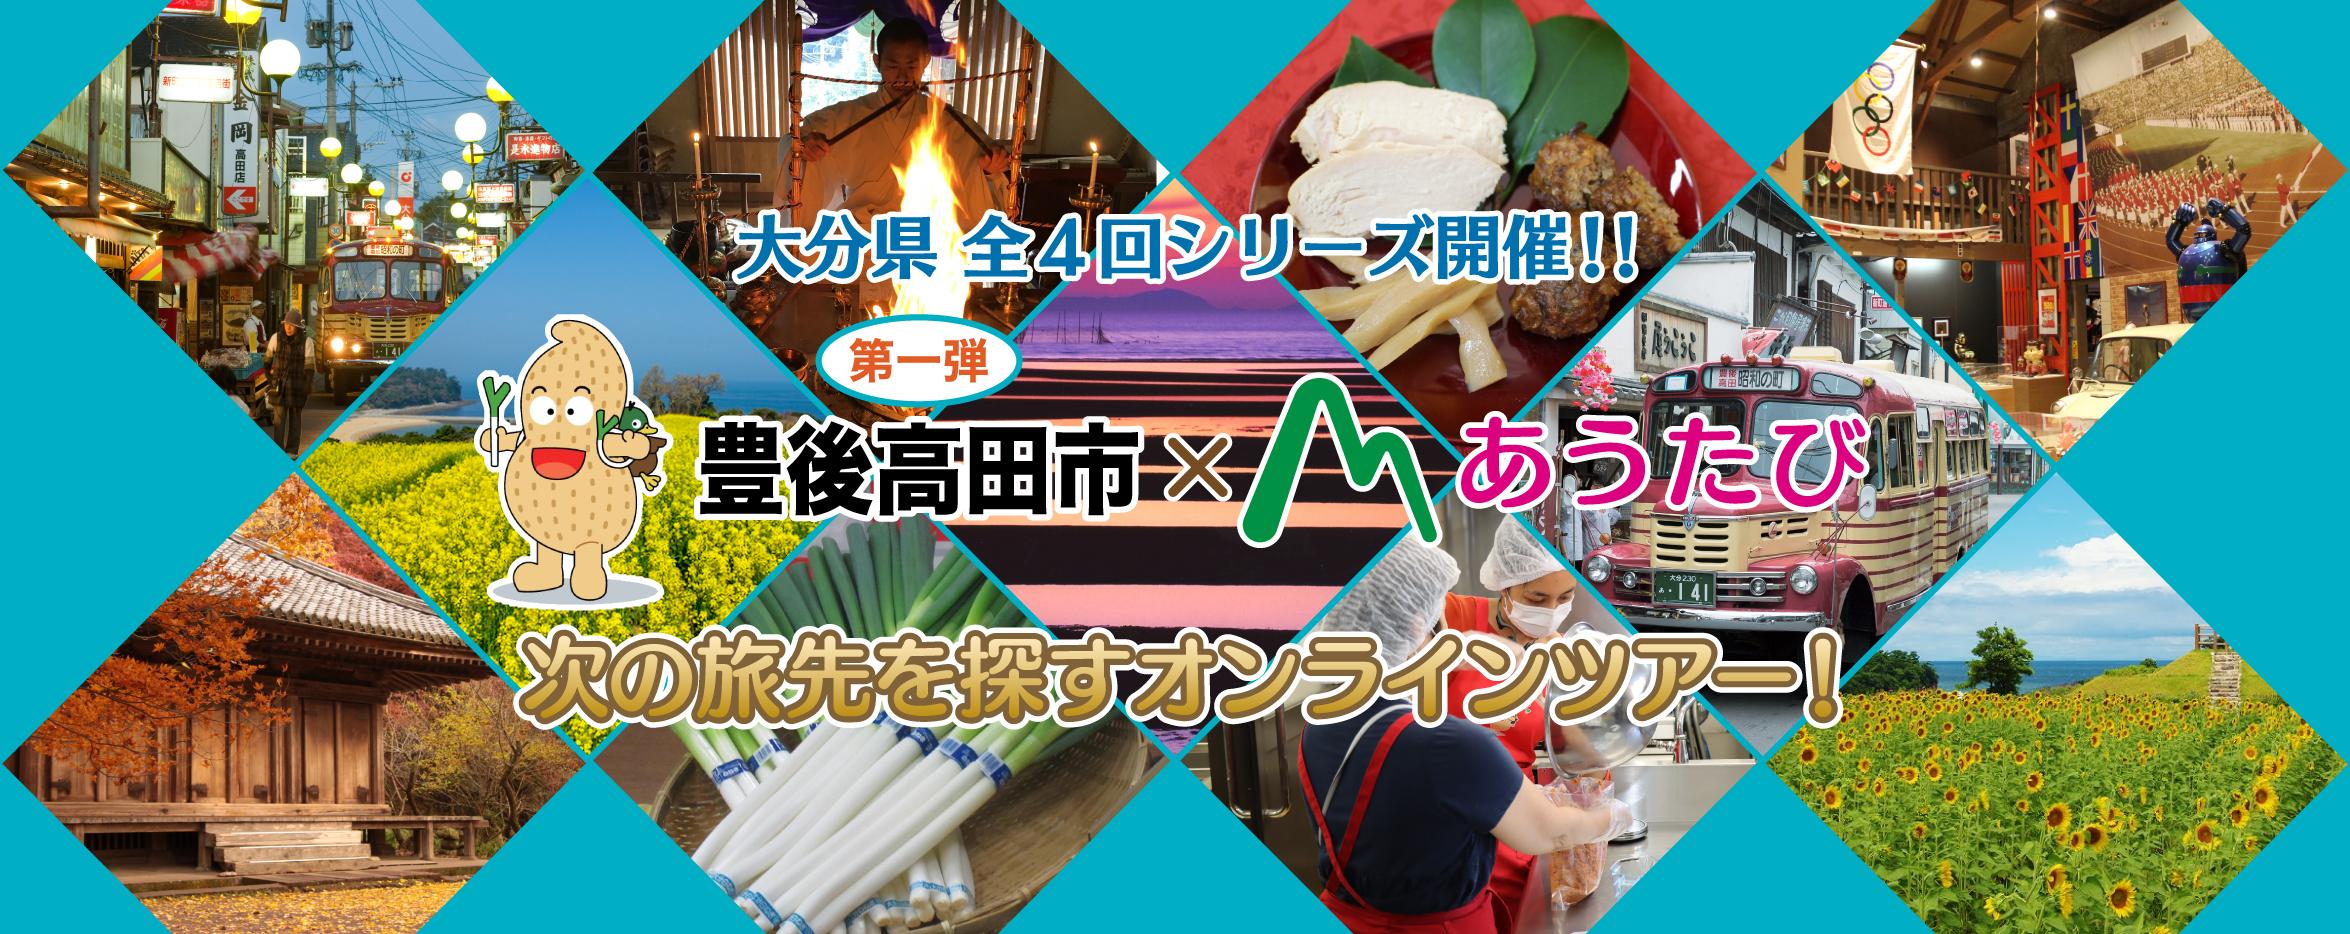 autabi_toyogotakada_tour_main_img01_201109